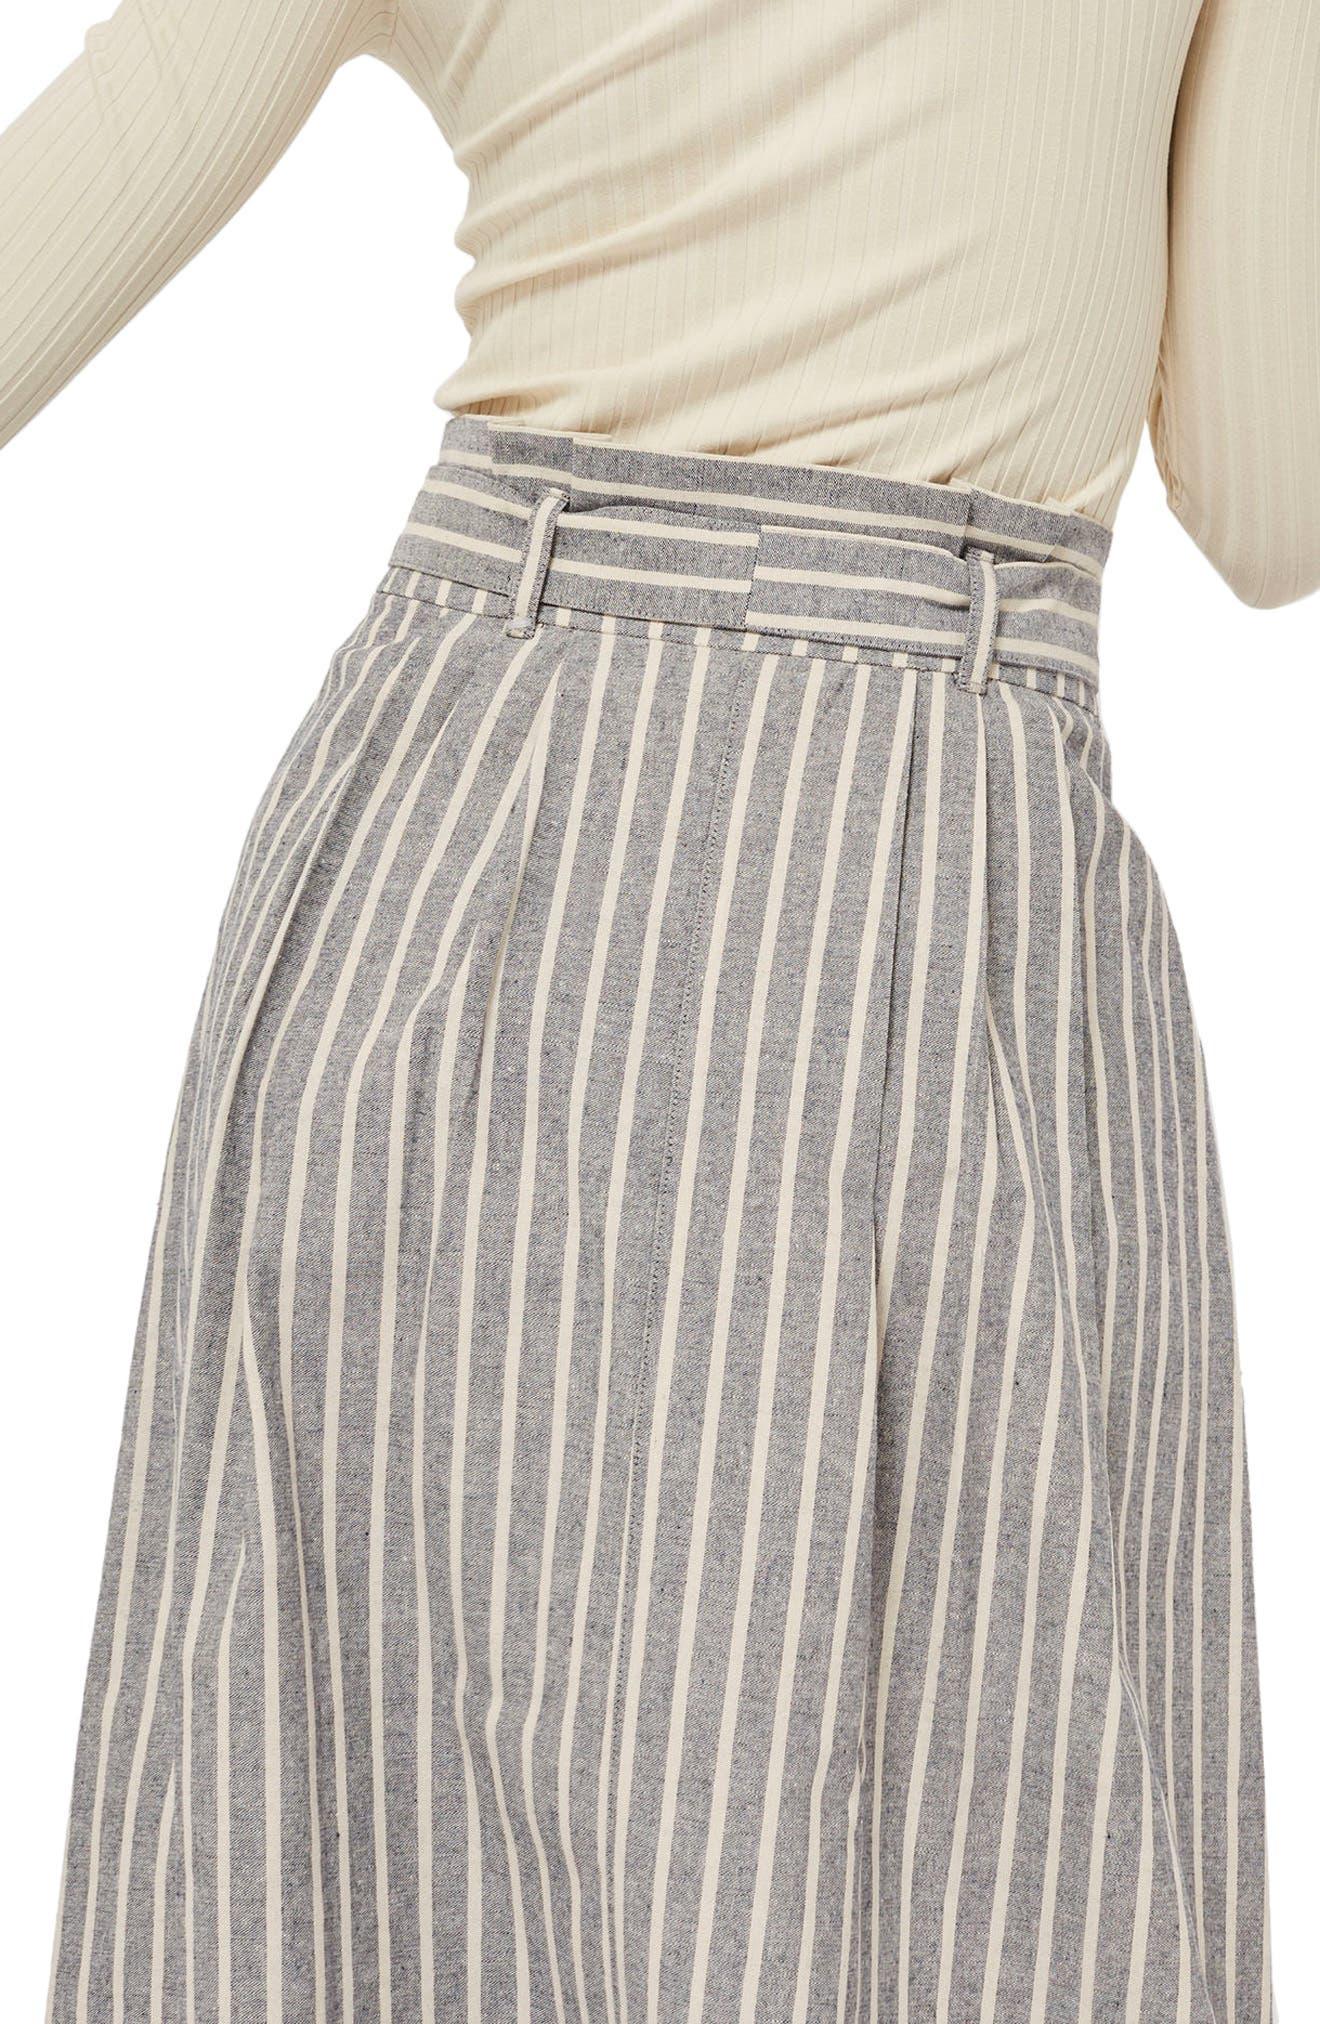 Stripe Tie Waist Midi Skirt,                             Alternate thumbnail 2, color,                             020